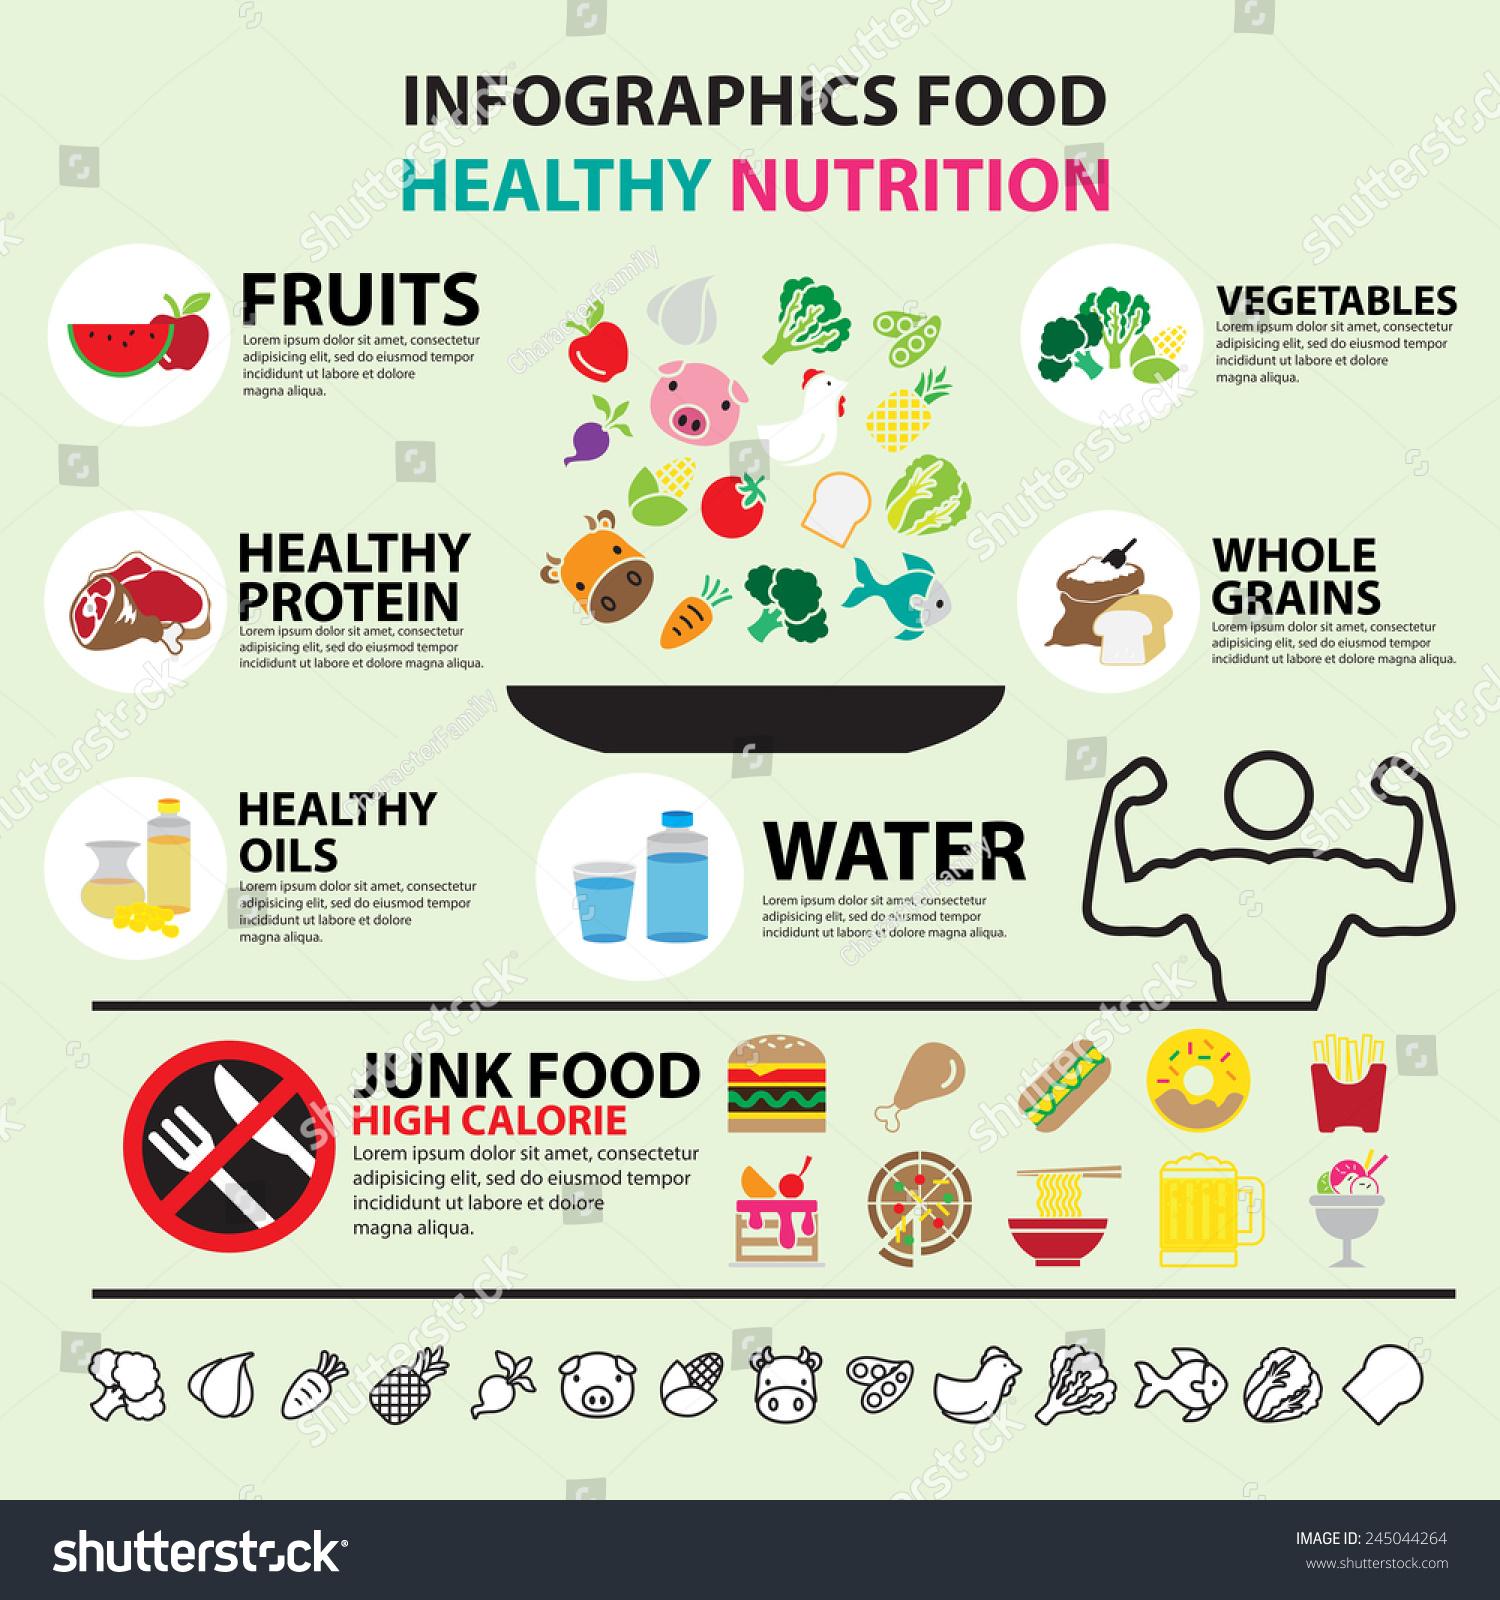 Infographic junk food